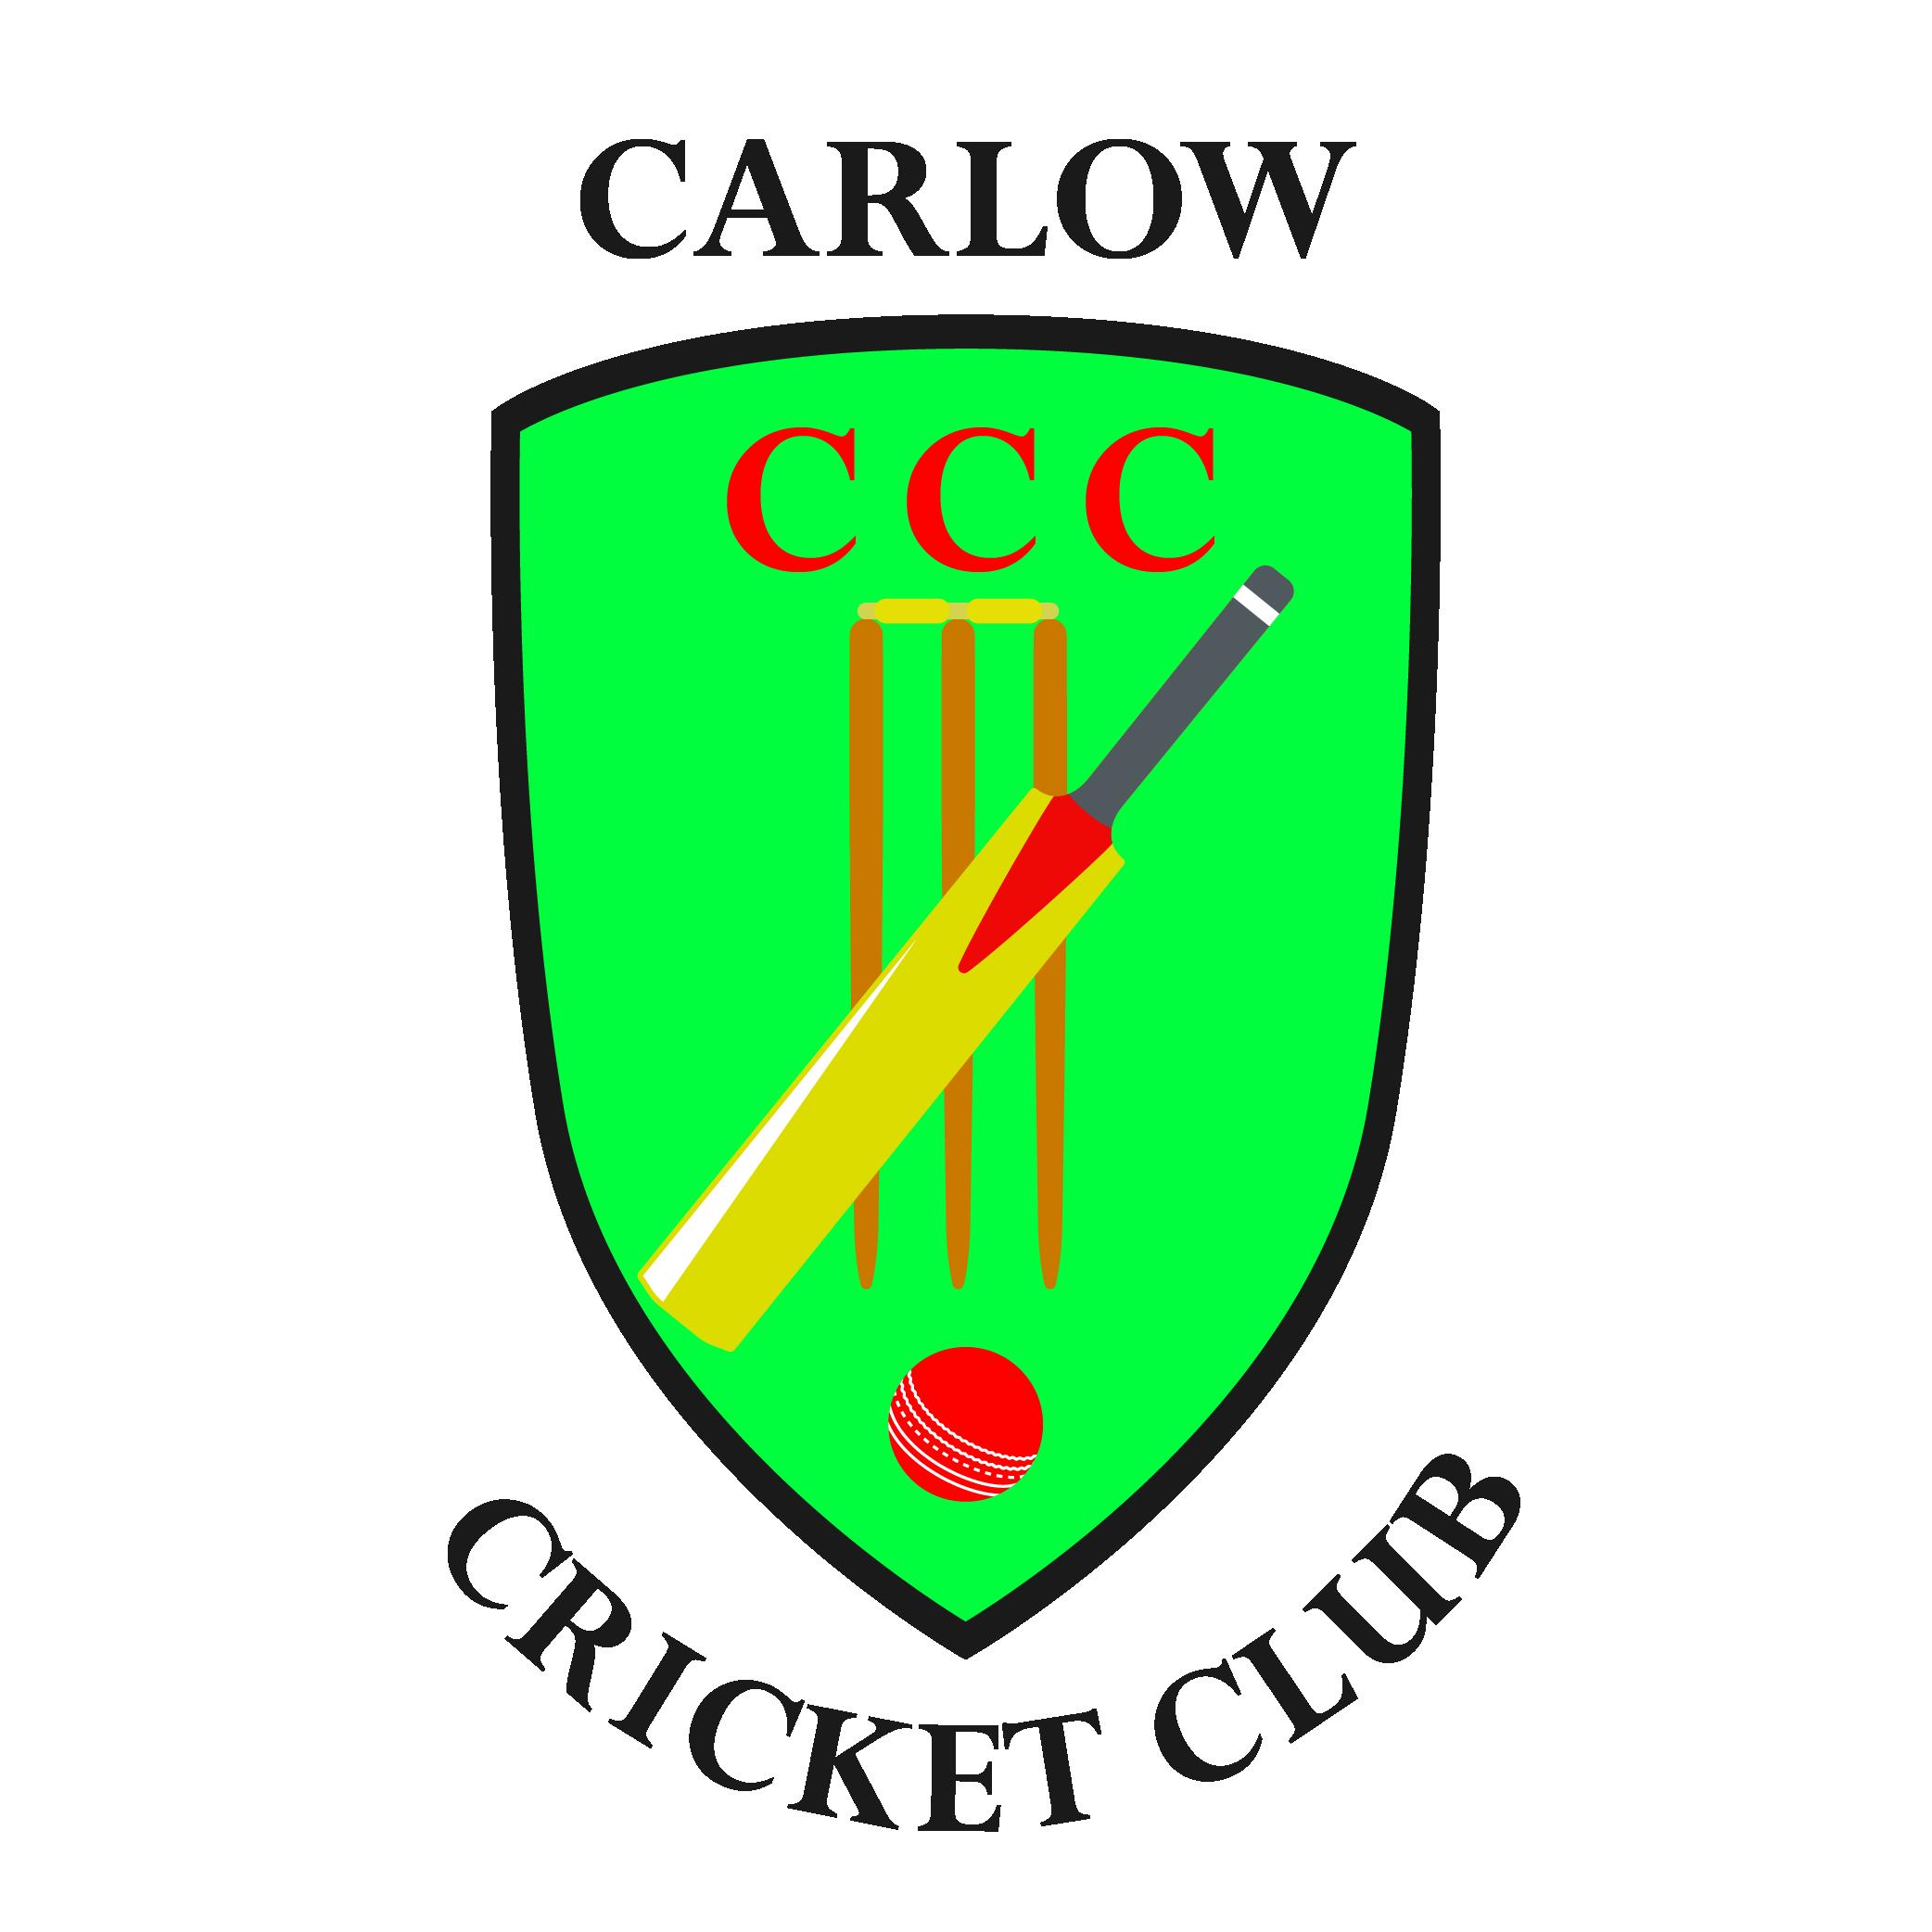 Carlow-Golf-Club - Club Choice USA